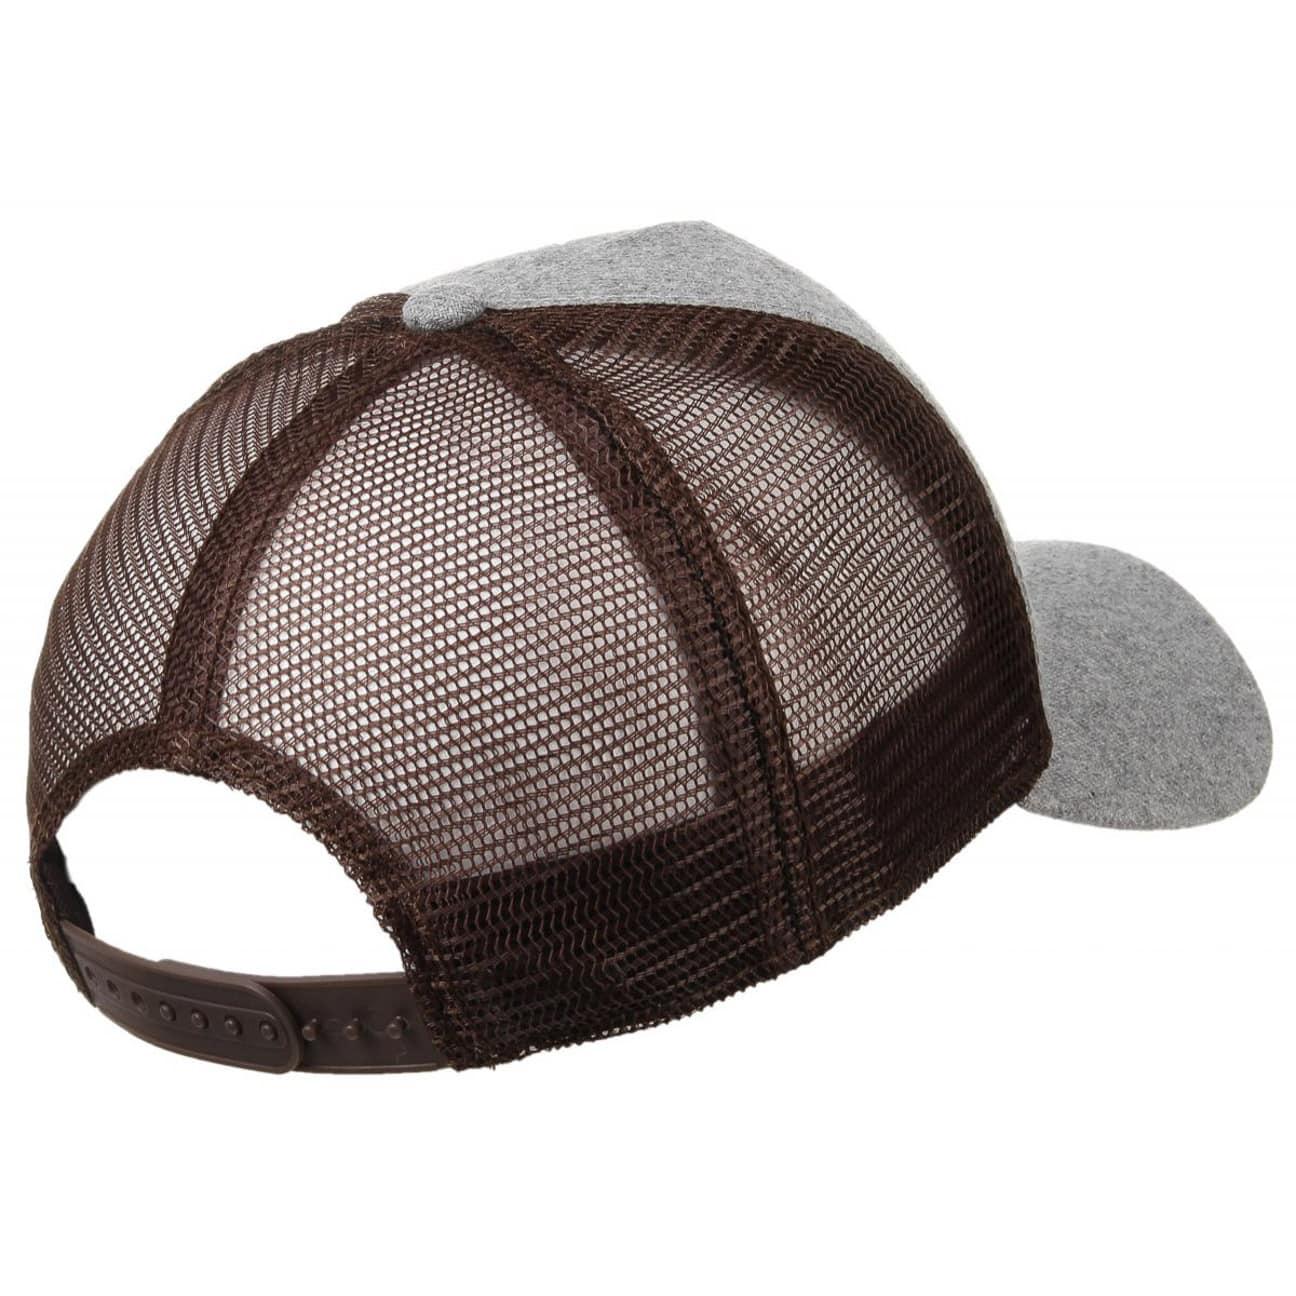 rhomb wool trucker cap by djinns gbp 19 95 hats caps. Black Bedroom Furniture Sets. Home Design Ideas